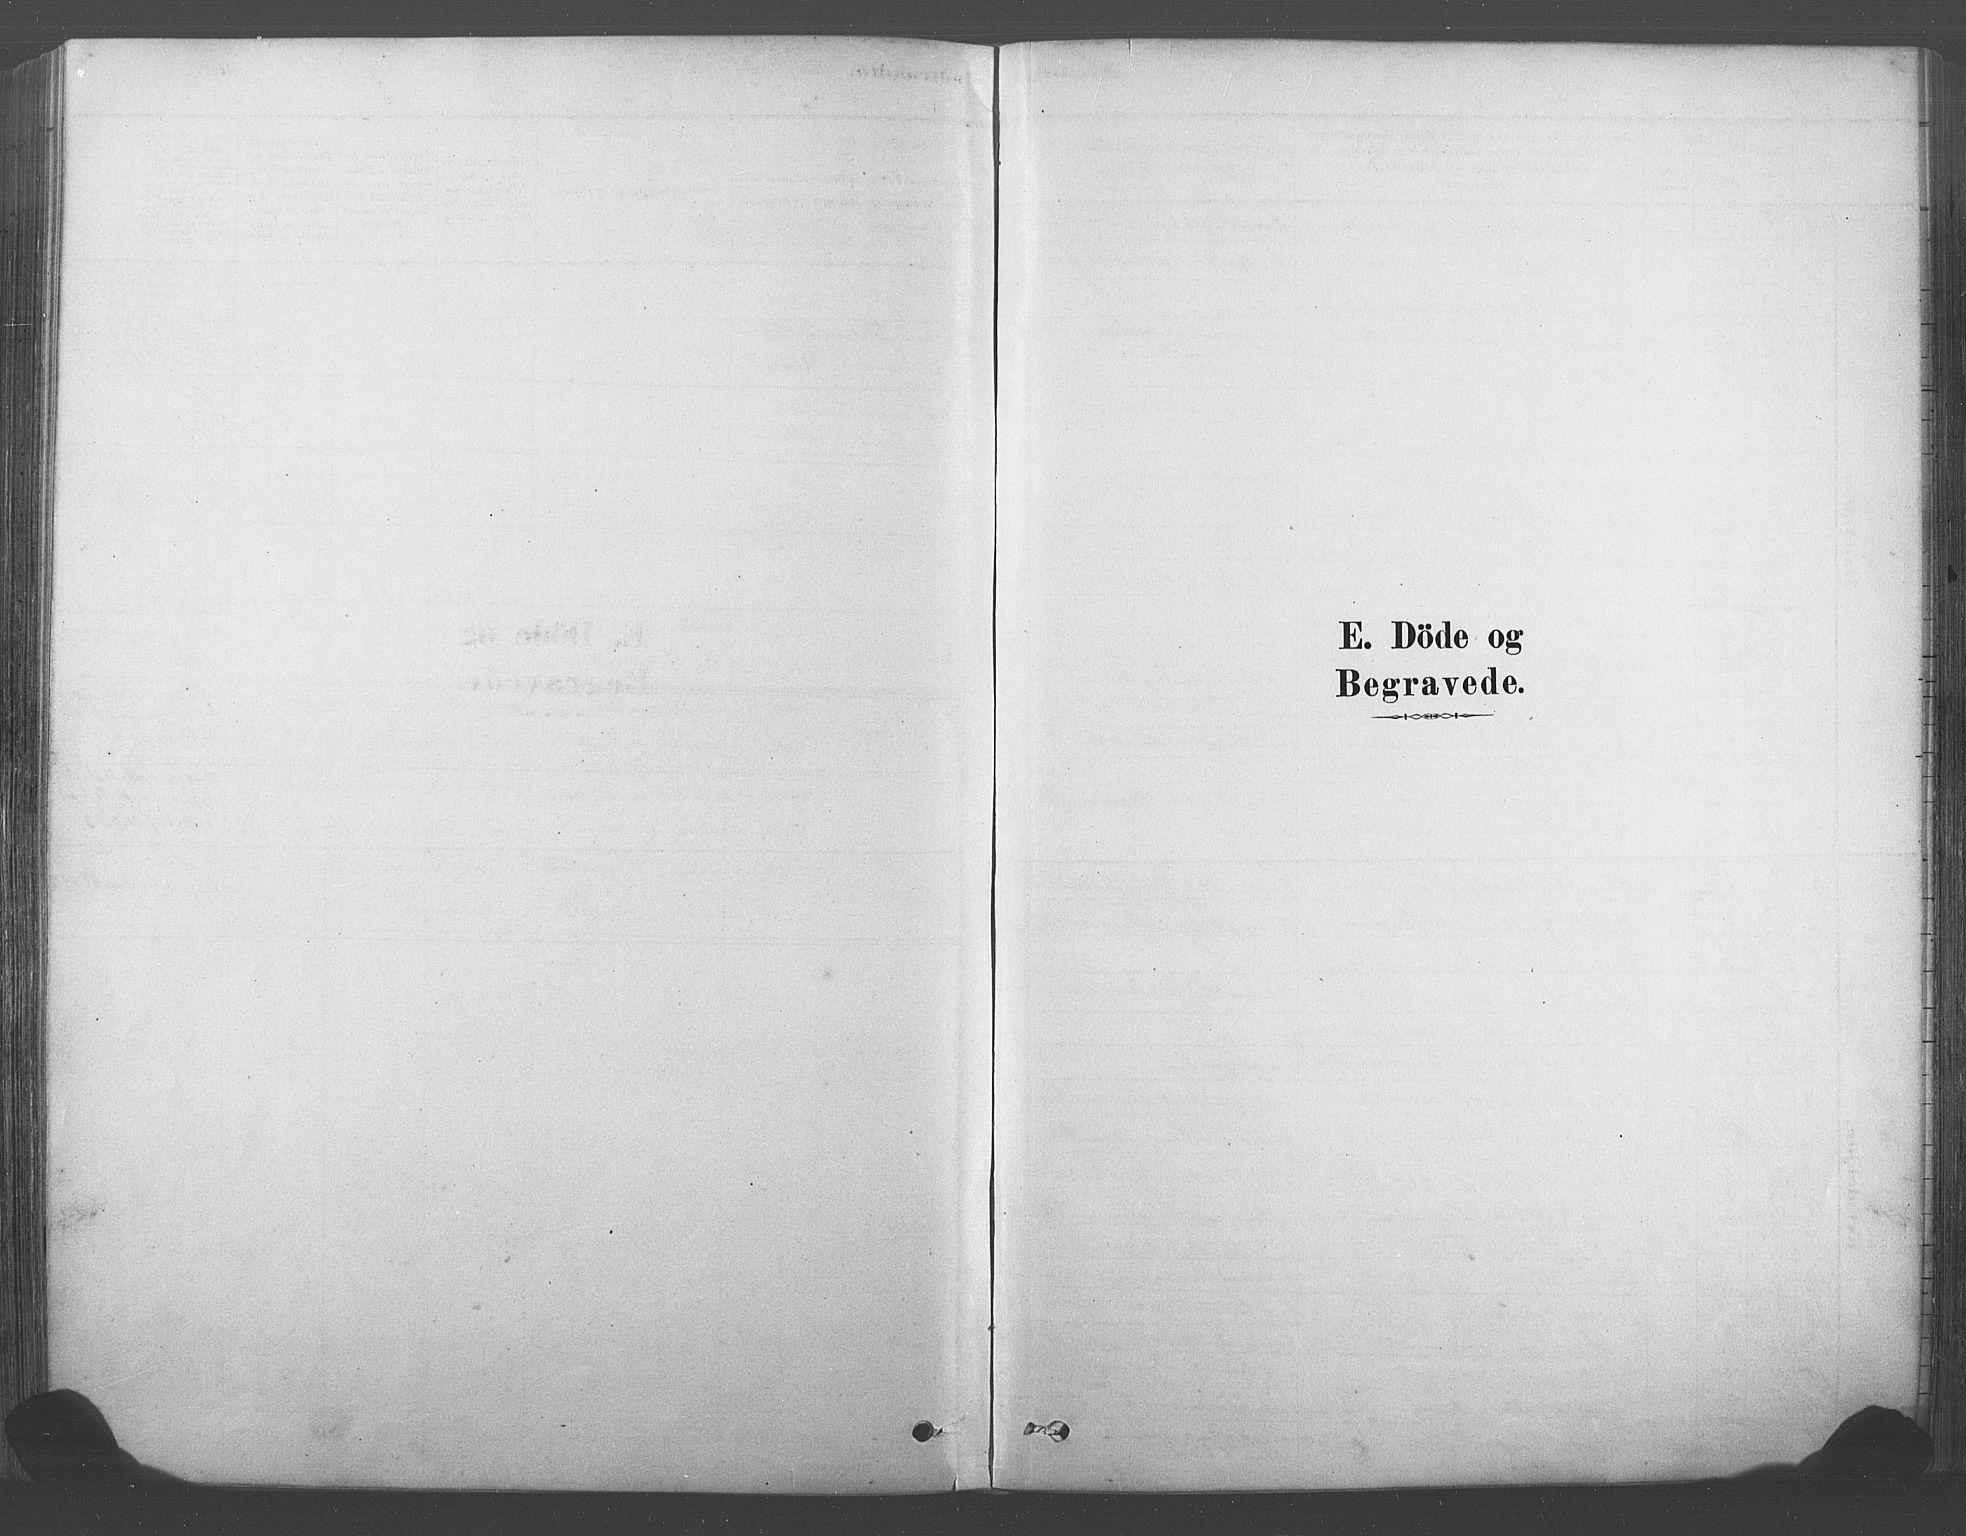 SAKO, Kongsberg kirkebøker, F/Fb/L0001: Ministerialbok nr. II 1, 1878-1886